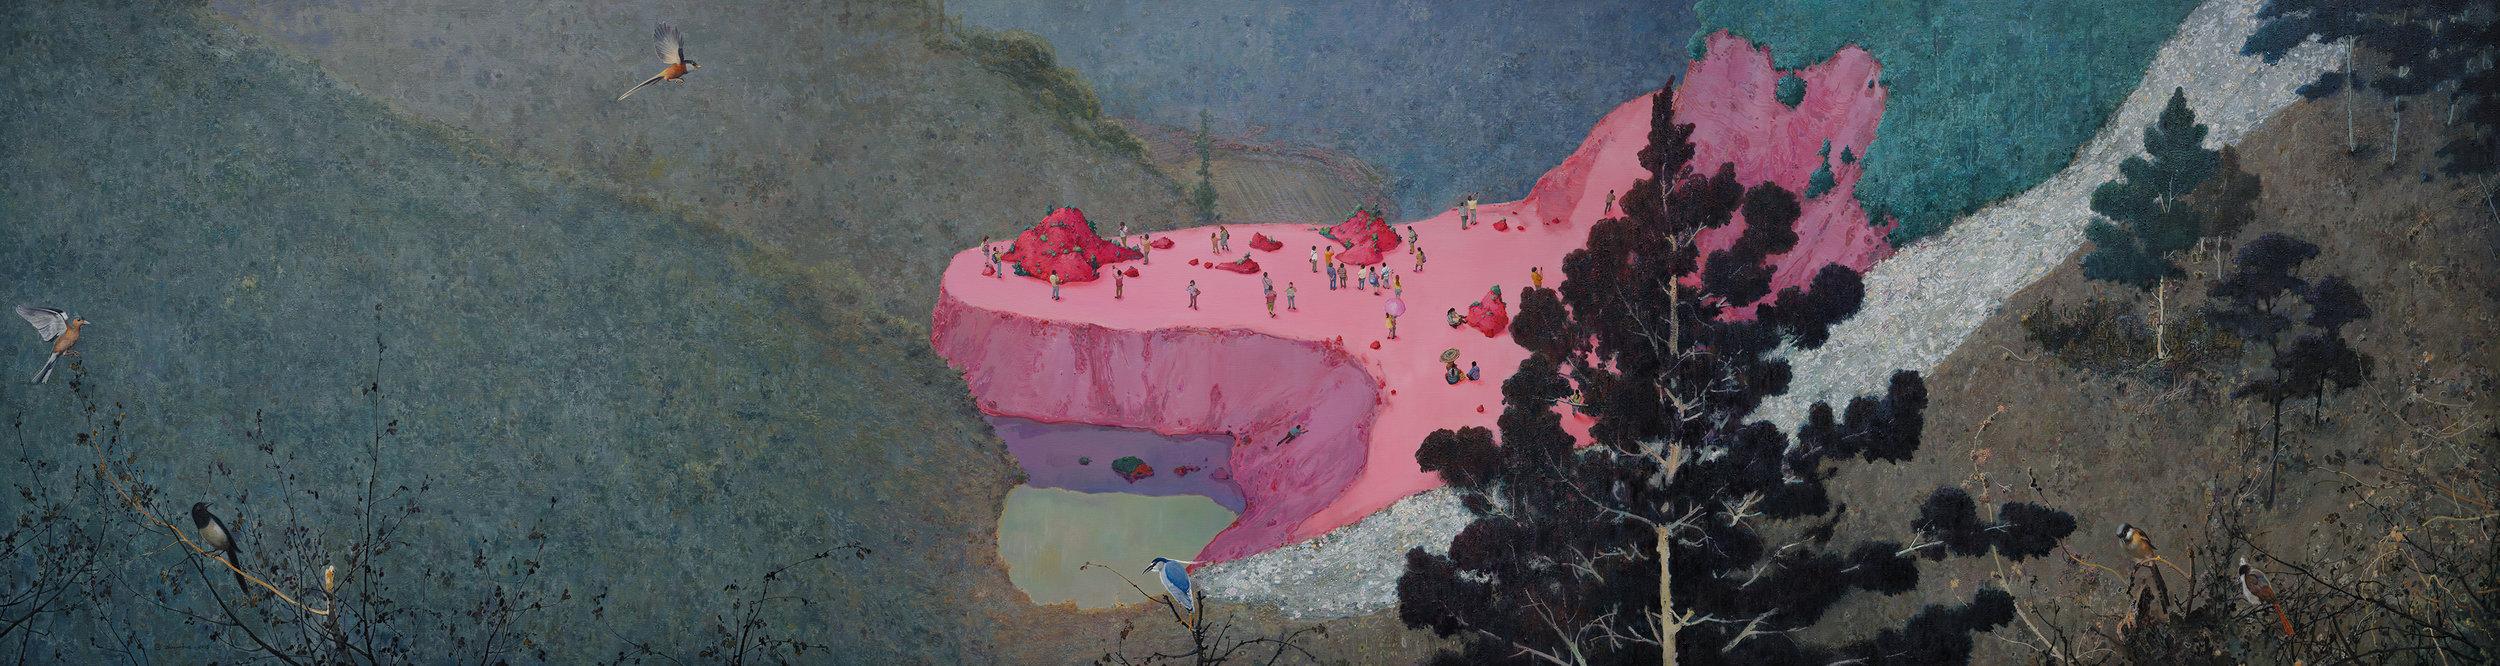 Zhou Jinhua 周金华, Scene Within a Scene 风景中的风景, 2018, Oil and acrylic on canvas 布面油彩、丙烯, 120 x 450 cm